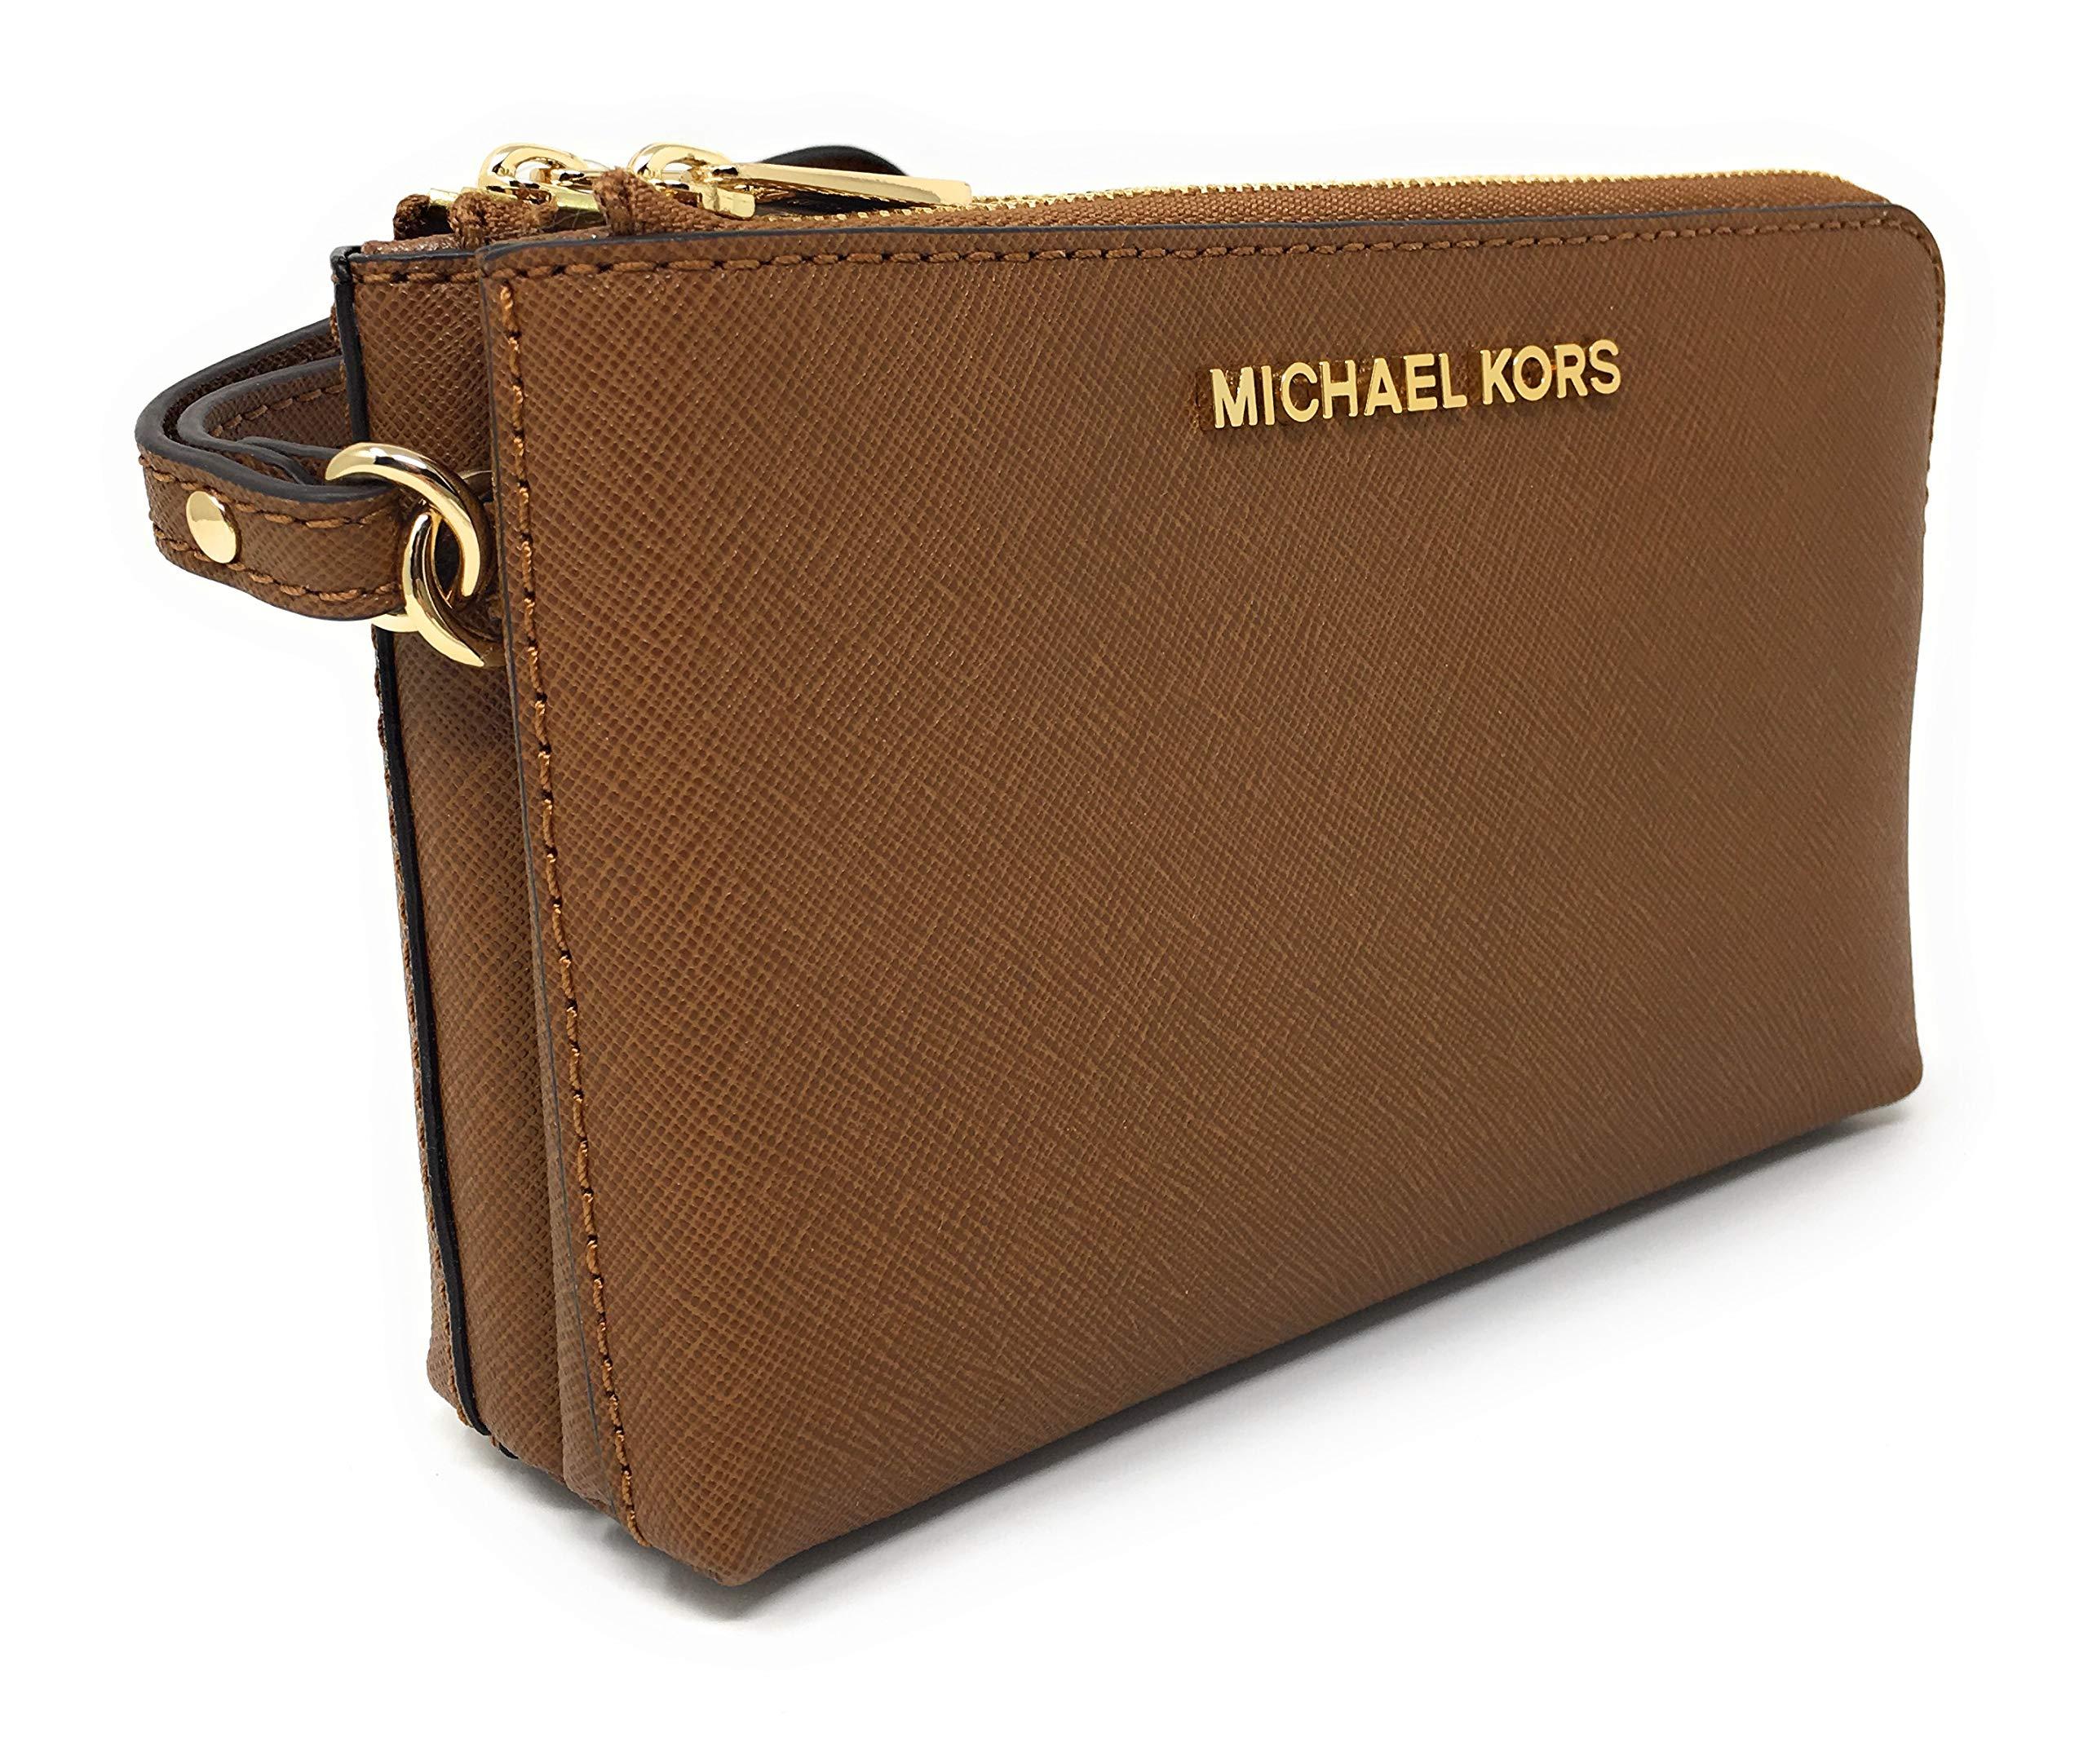 Michael Kors Jet Set Travel Large Double Gusset Top Zip Saffiano Leather Wristlet (Luggage)